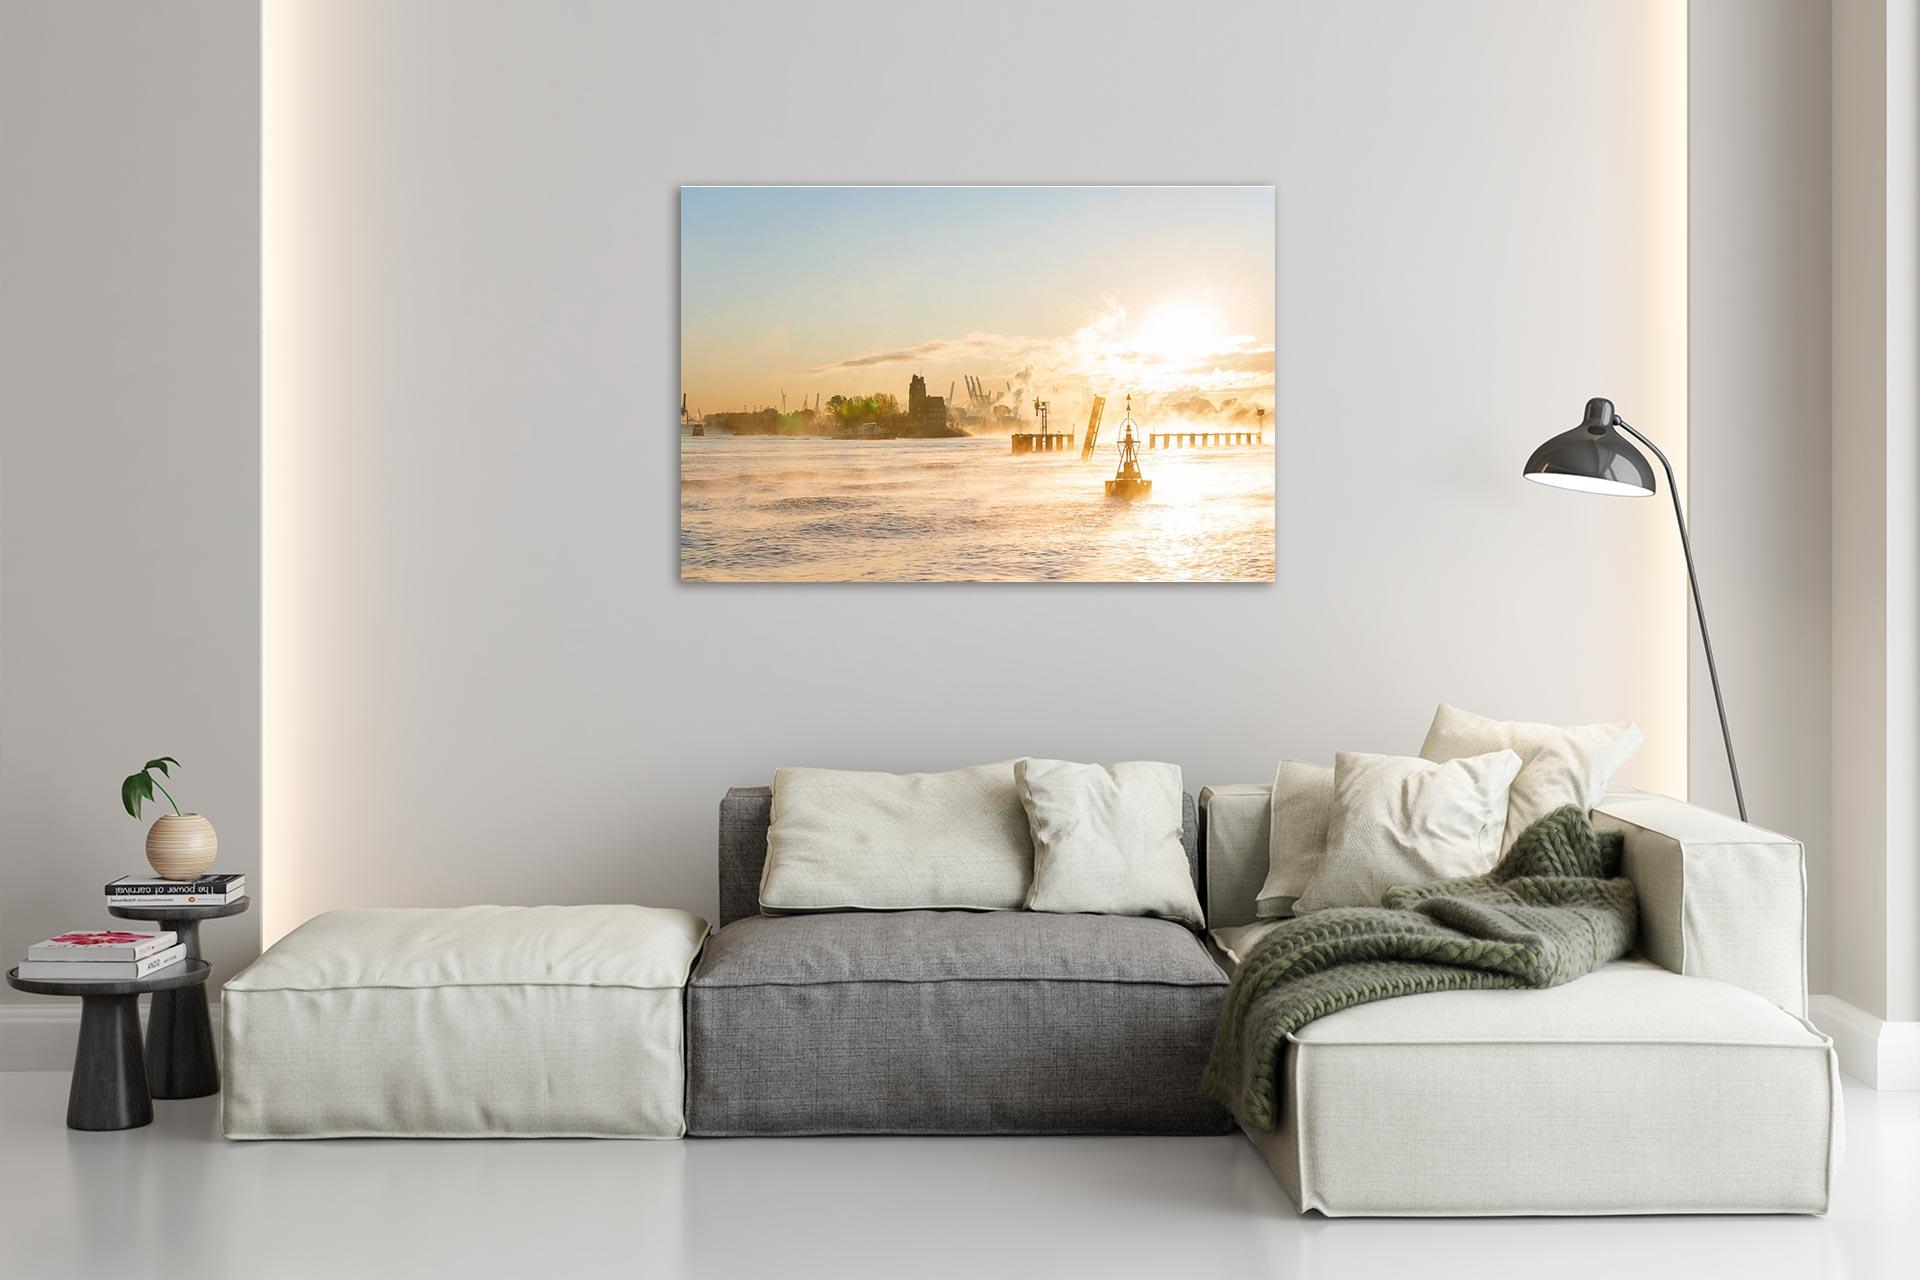 LCW278-bubendey-hamburg-wandbild-bild-auf-leinwand-acrylglas-aludibond-wohnzimmer